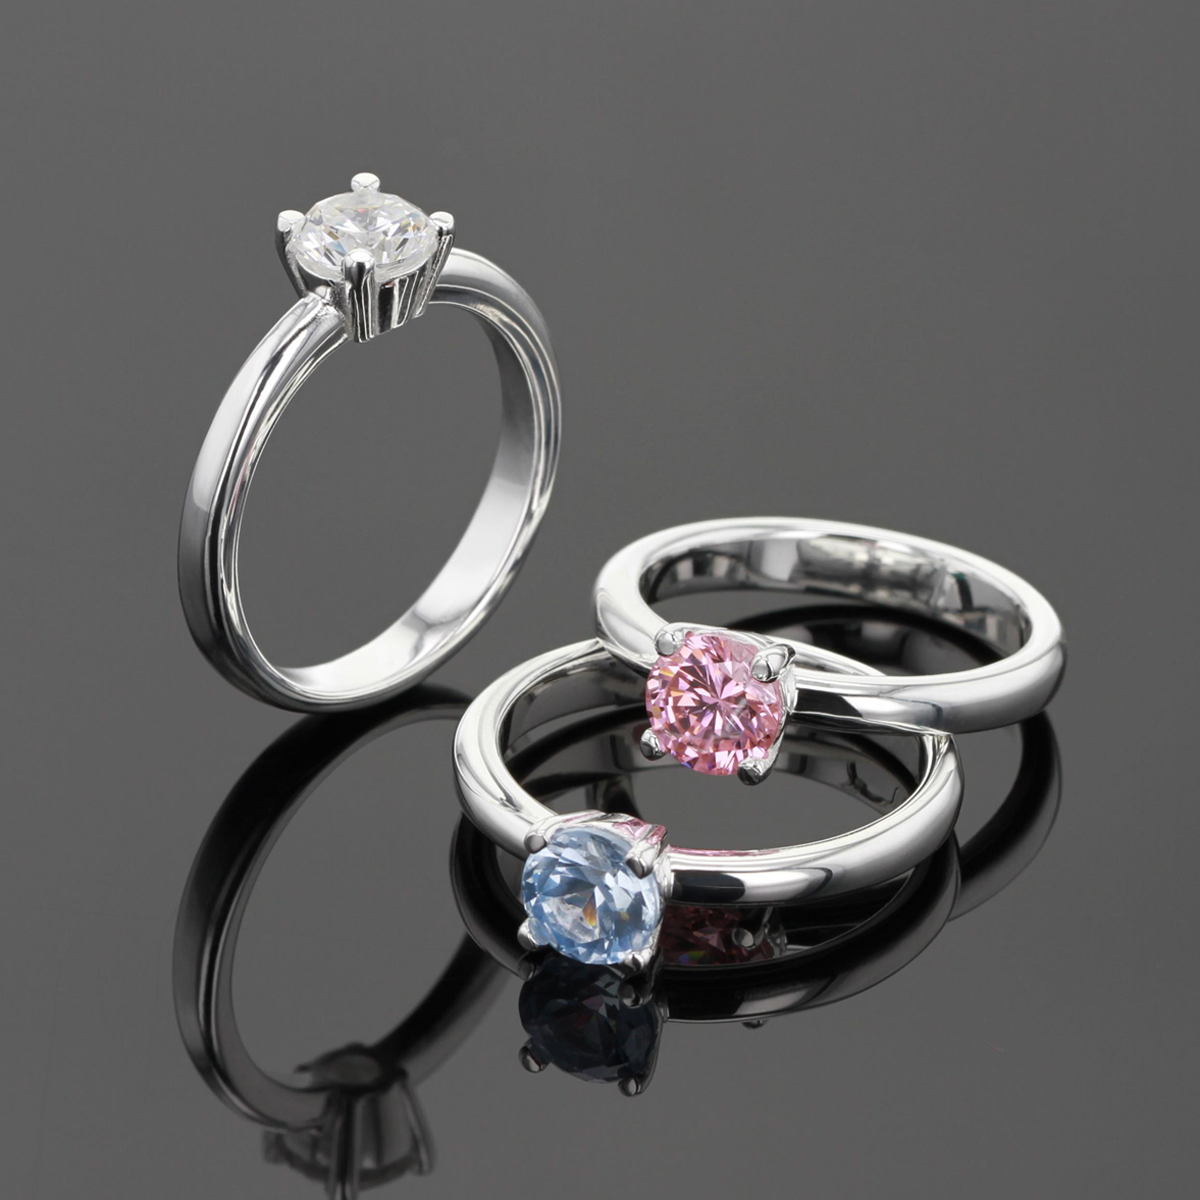 Silver zirconia rings